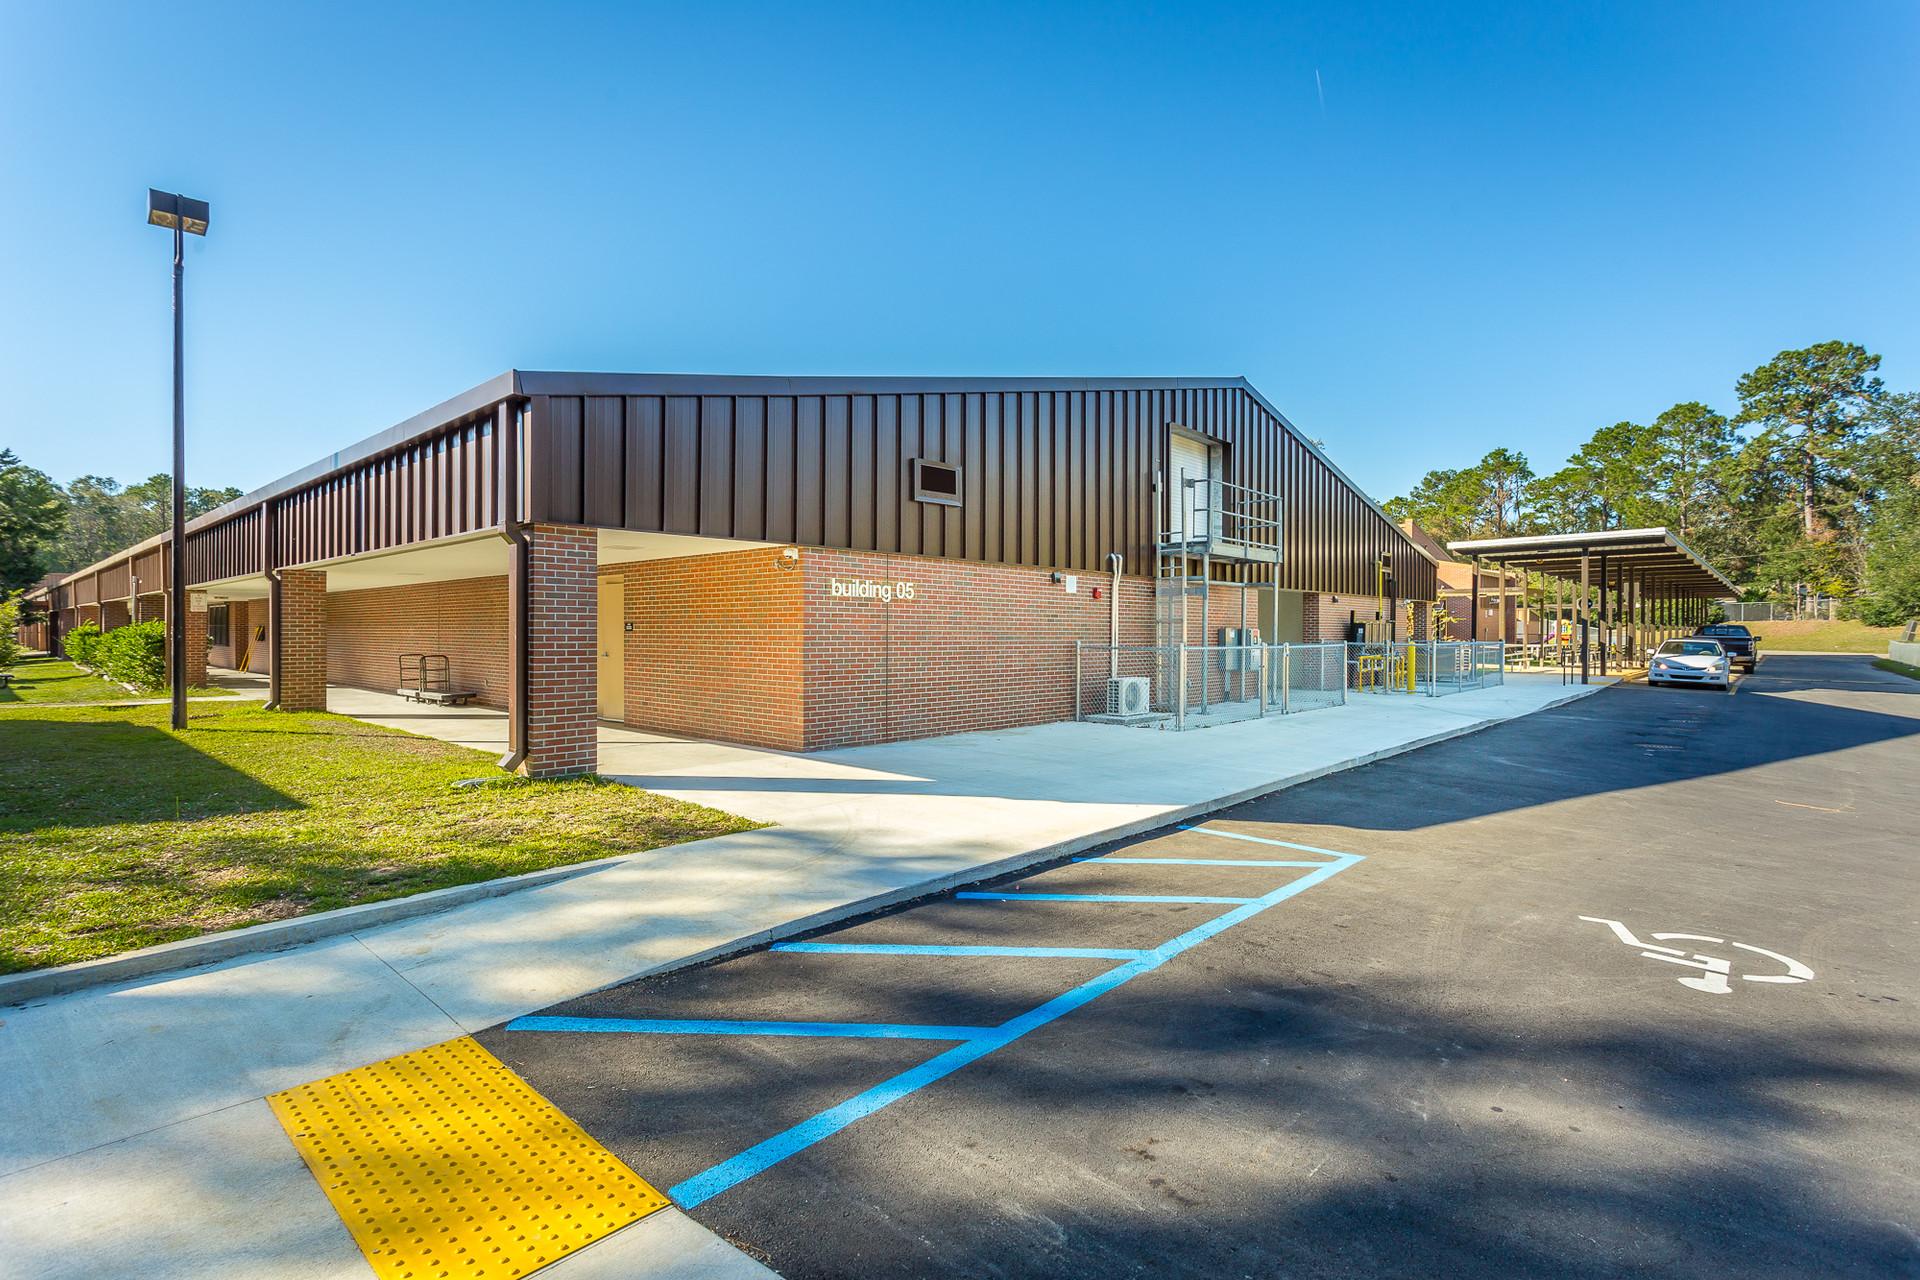 Springwood Elementary School